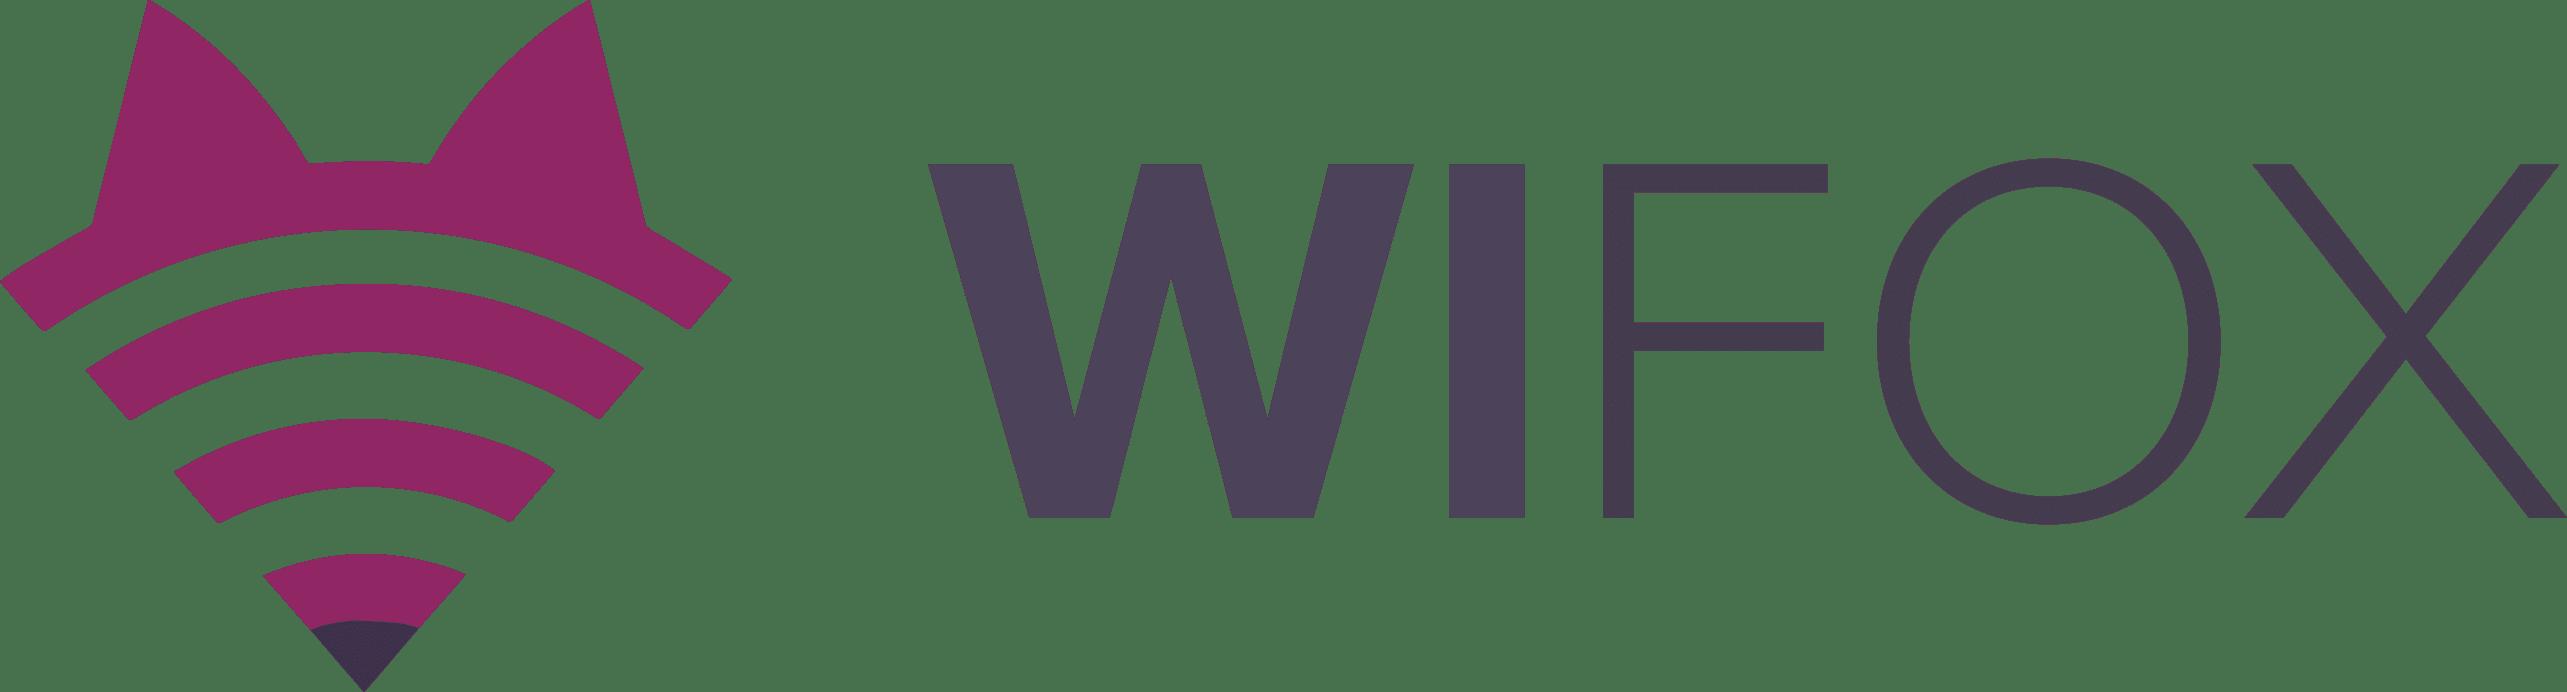 Wifox-Hotel